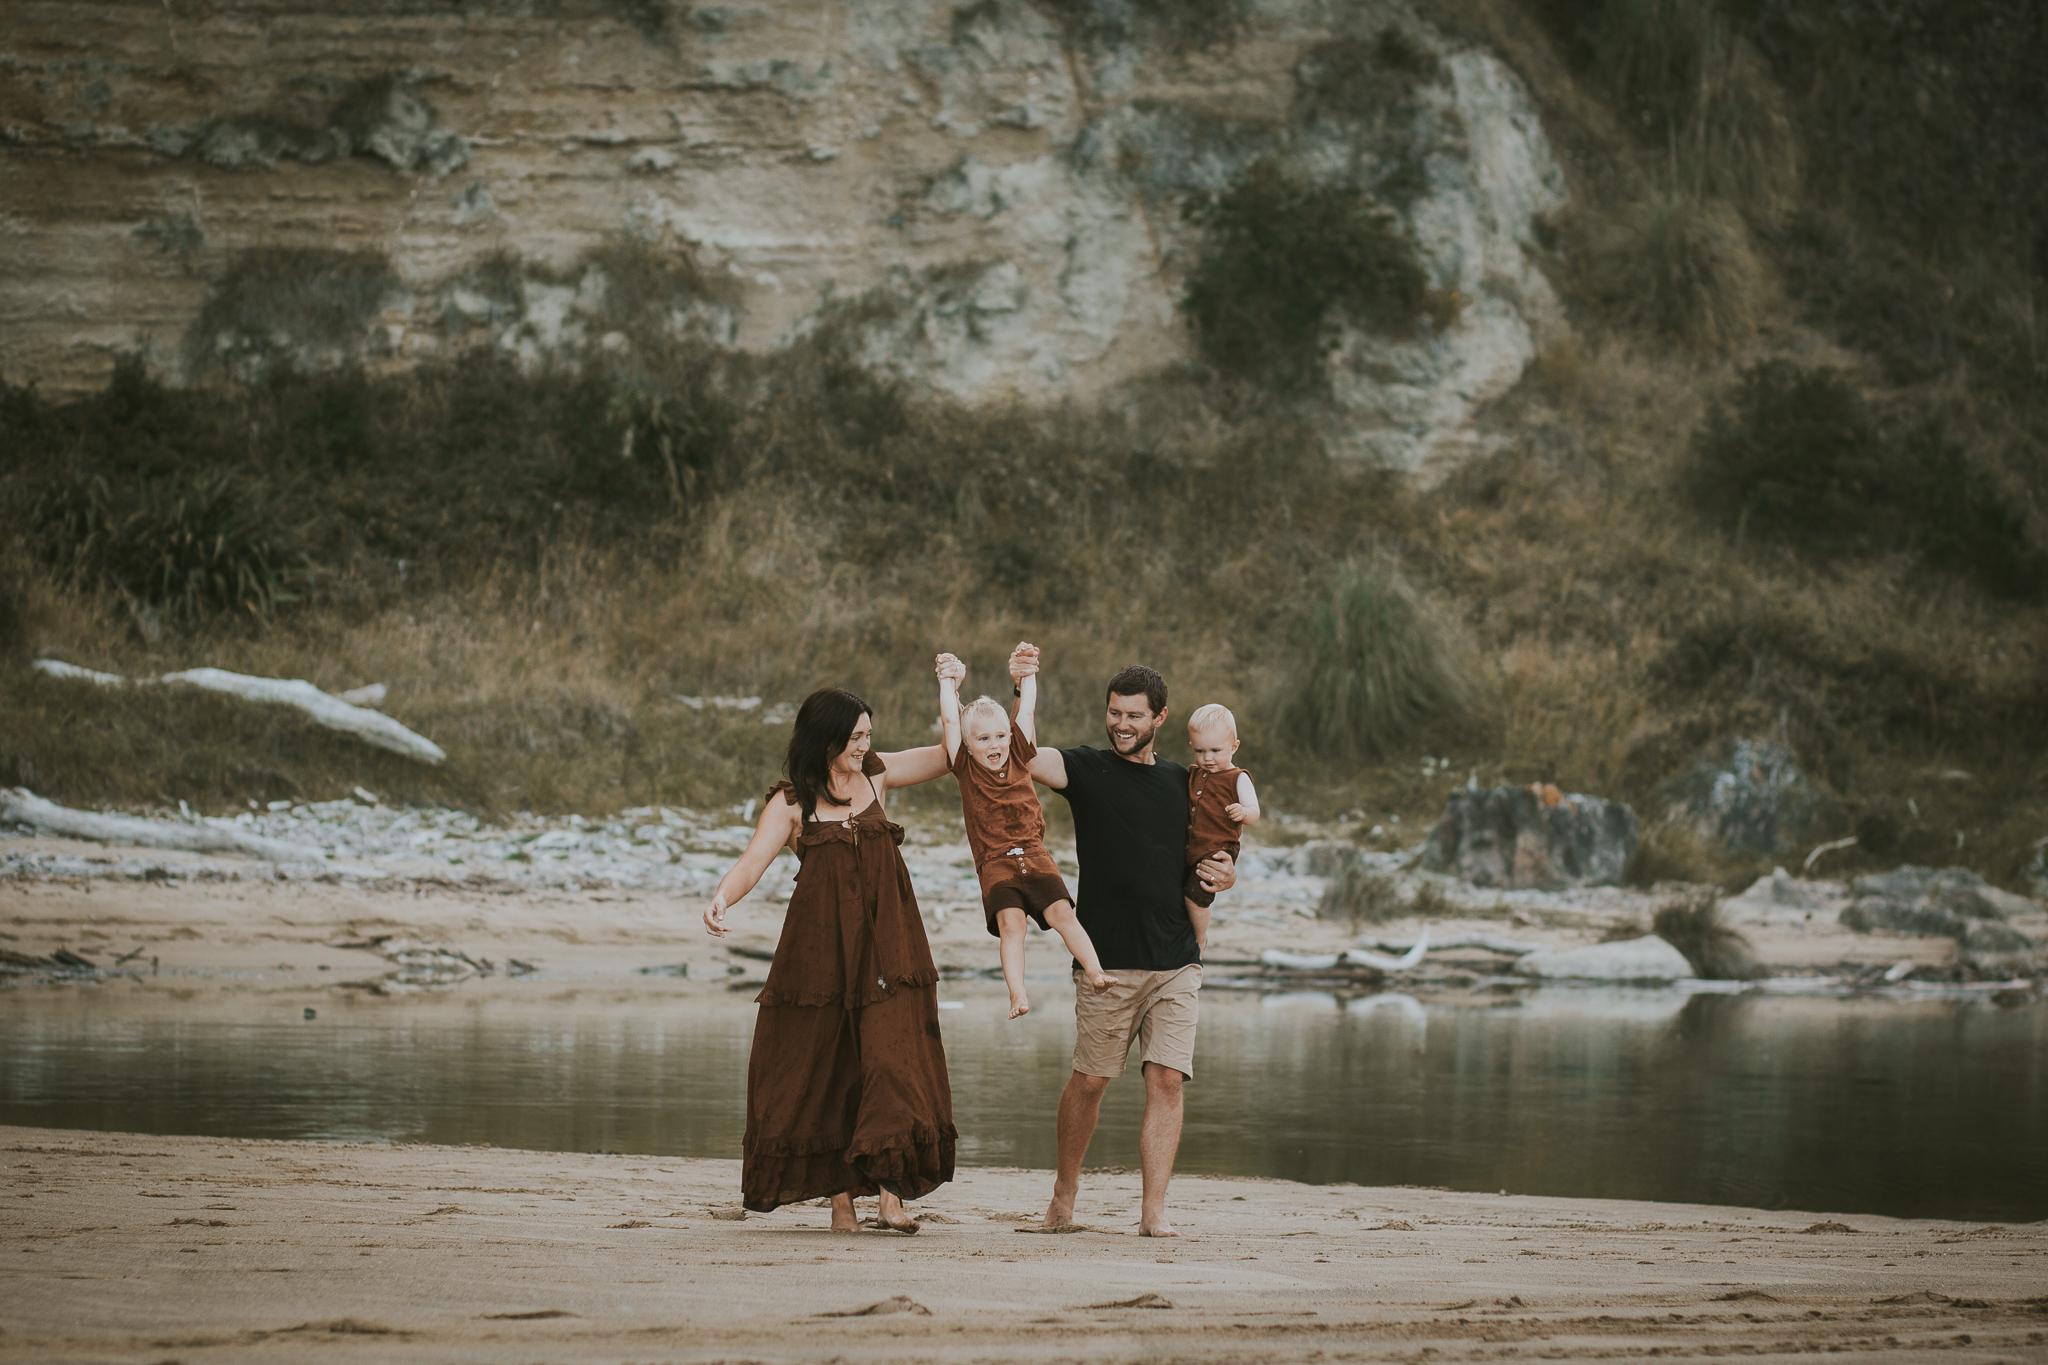 Nz Hawkes Bay Napier Wedding photographer waipatiki beach-70.jpg